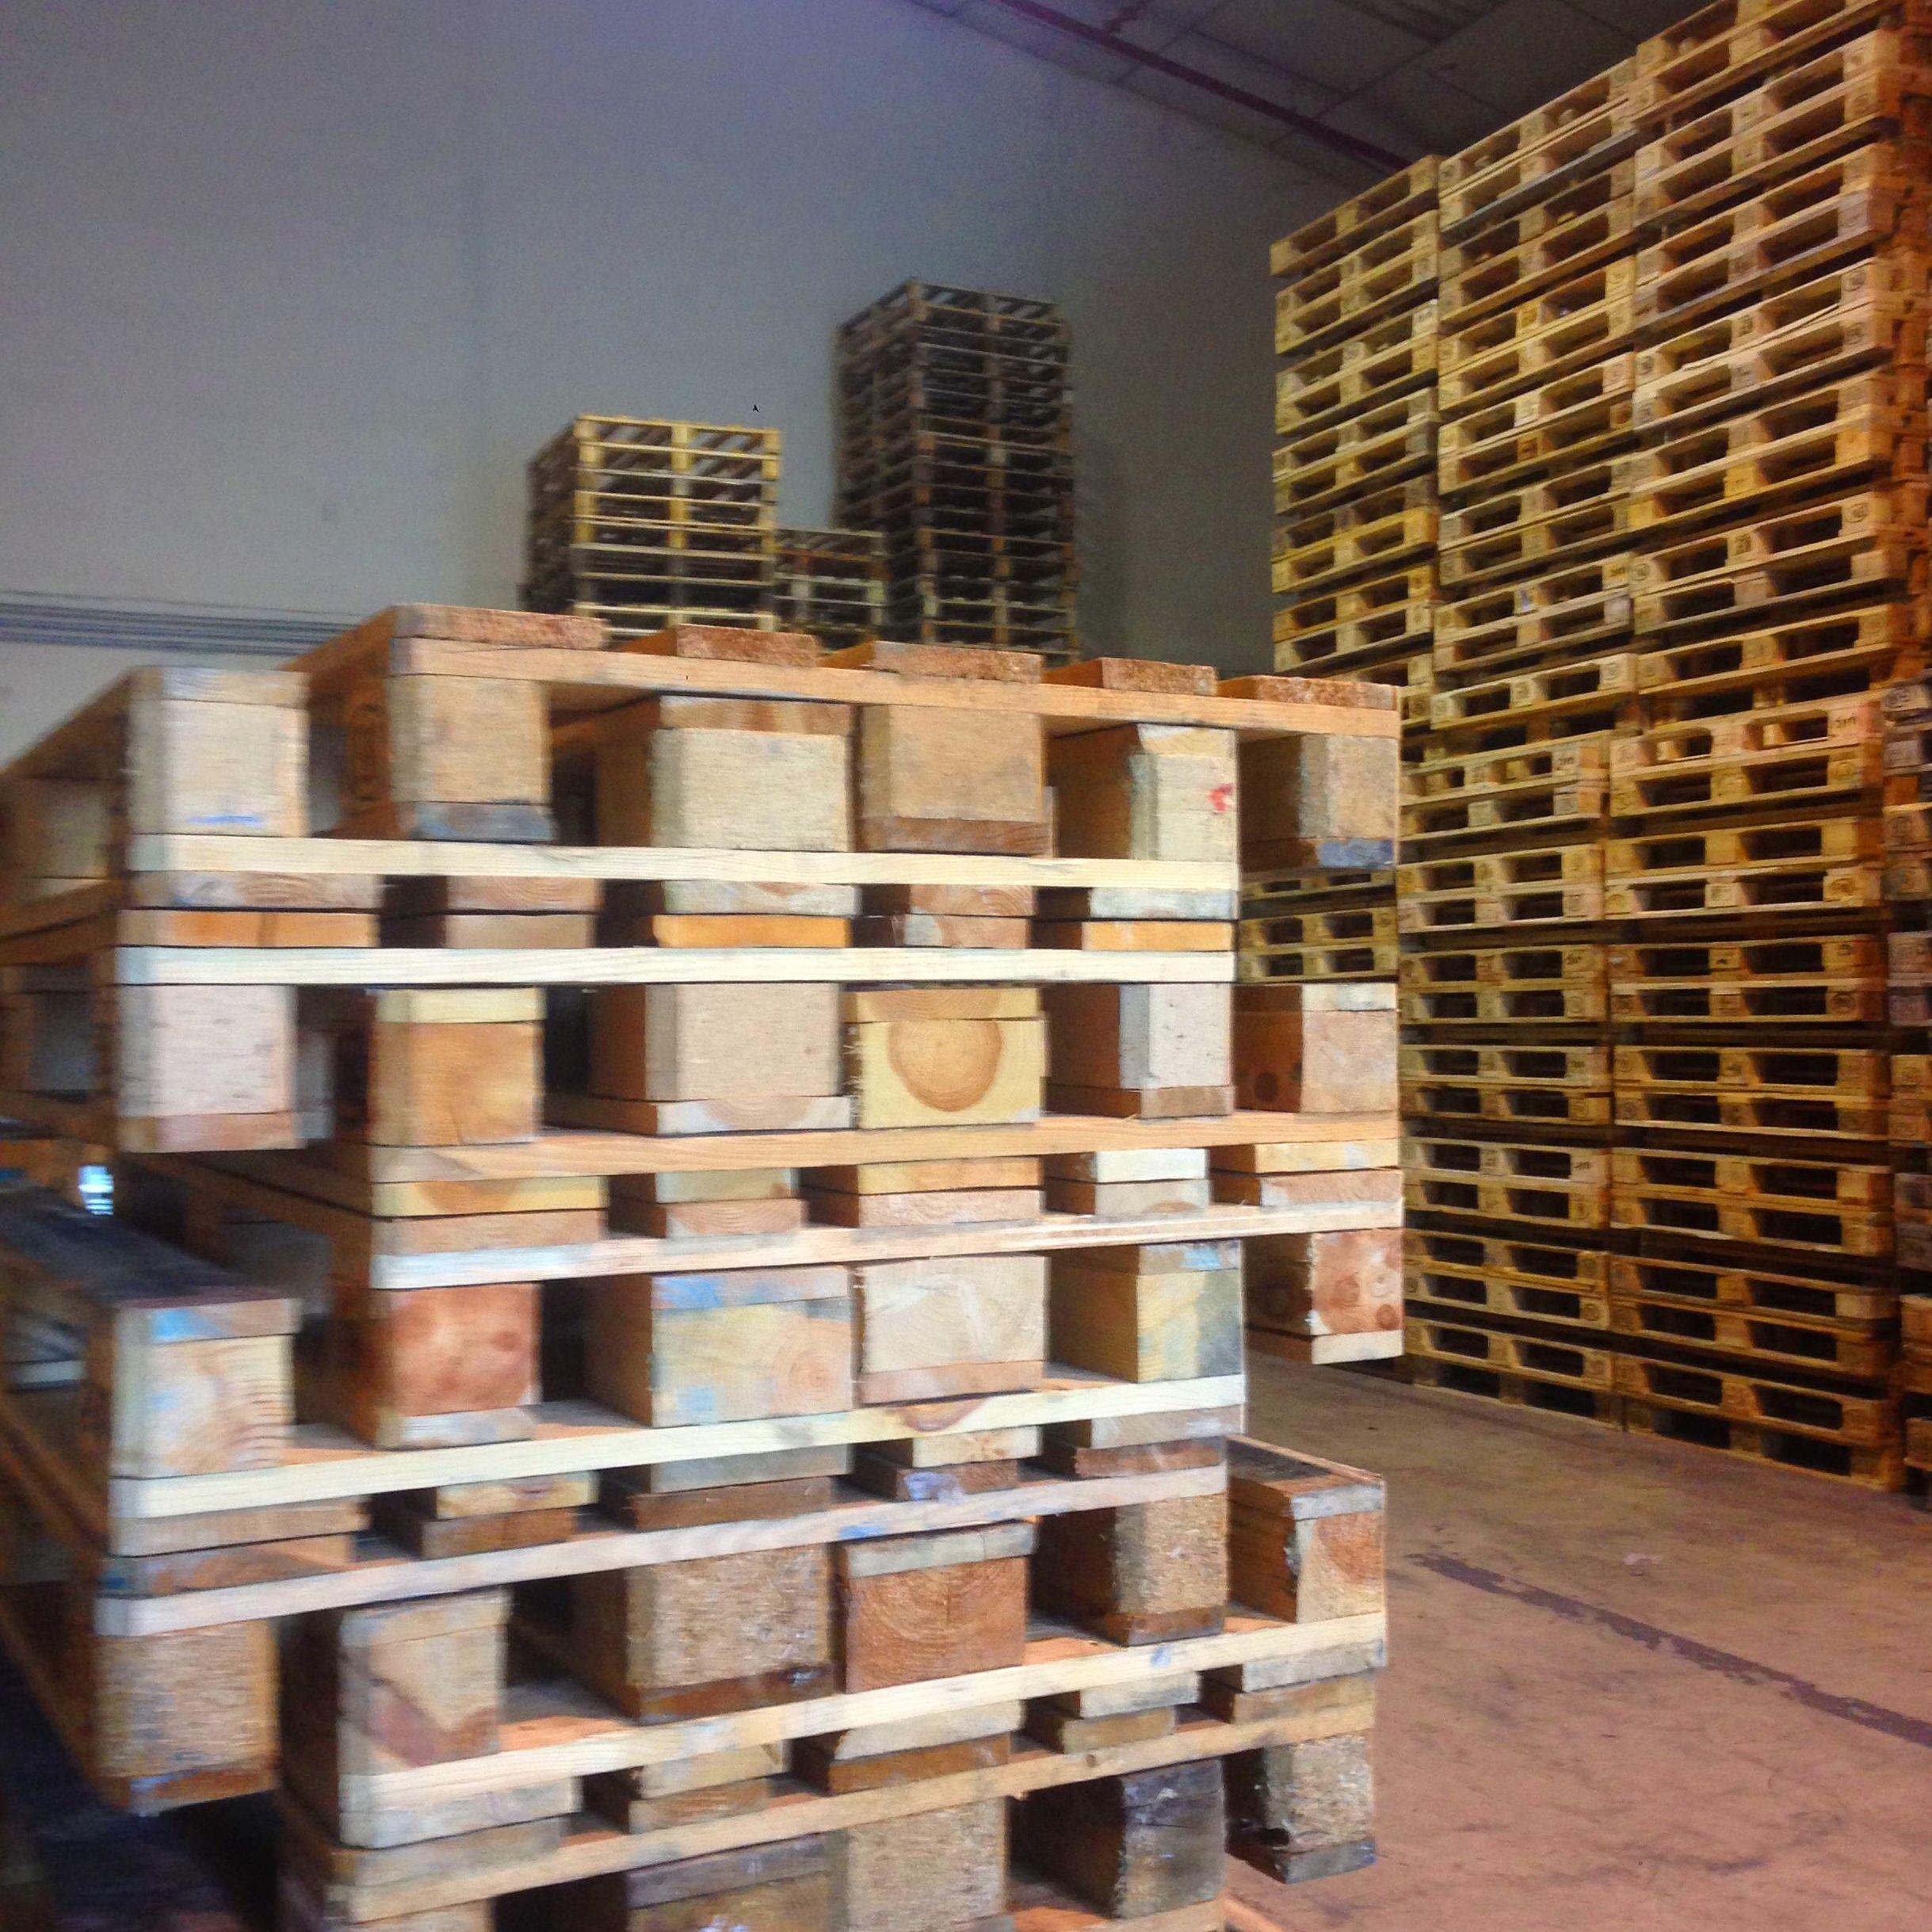 Foto 4 de Reciclaje de residuos en Manises | PalePlast, S. L.